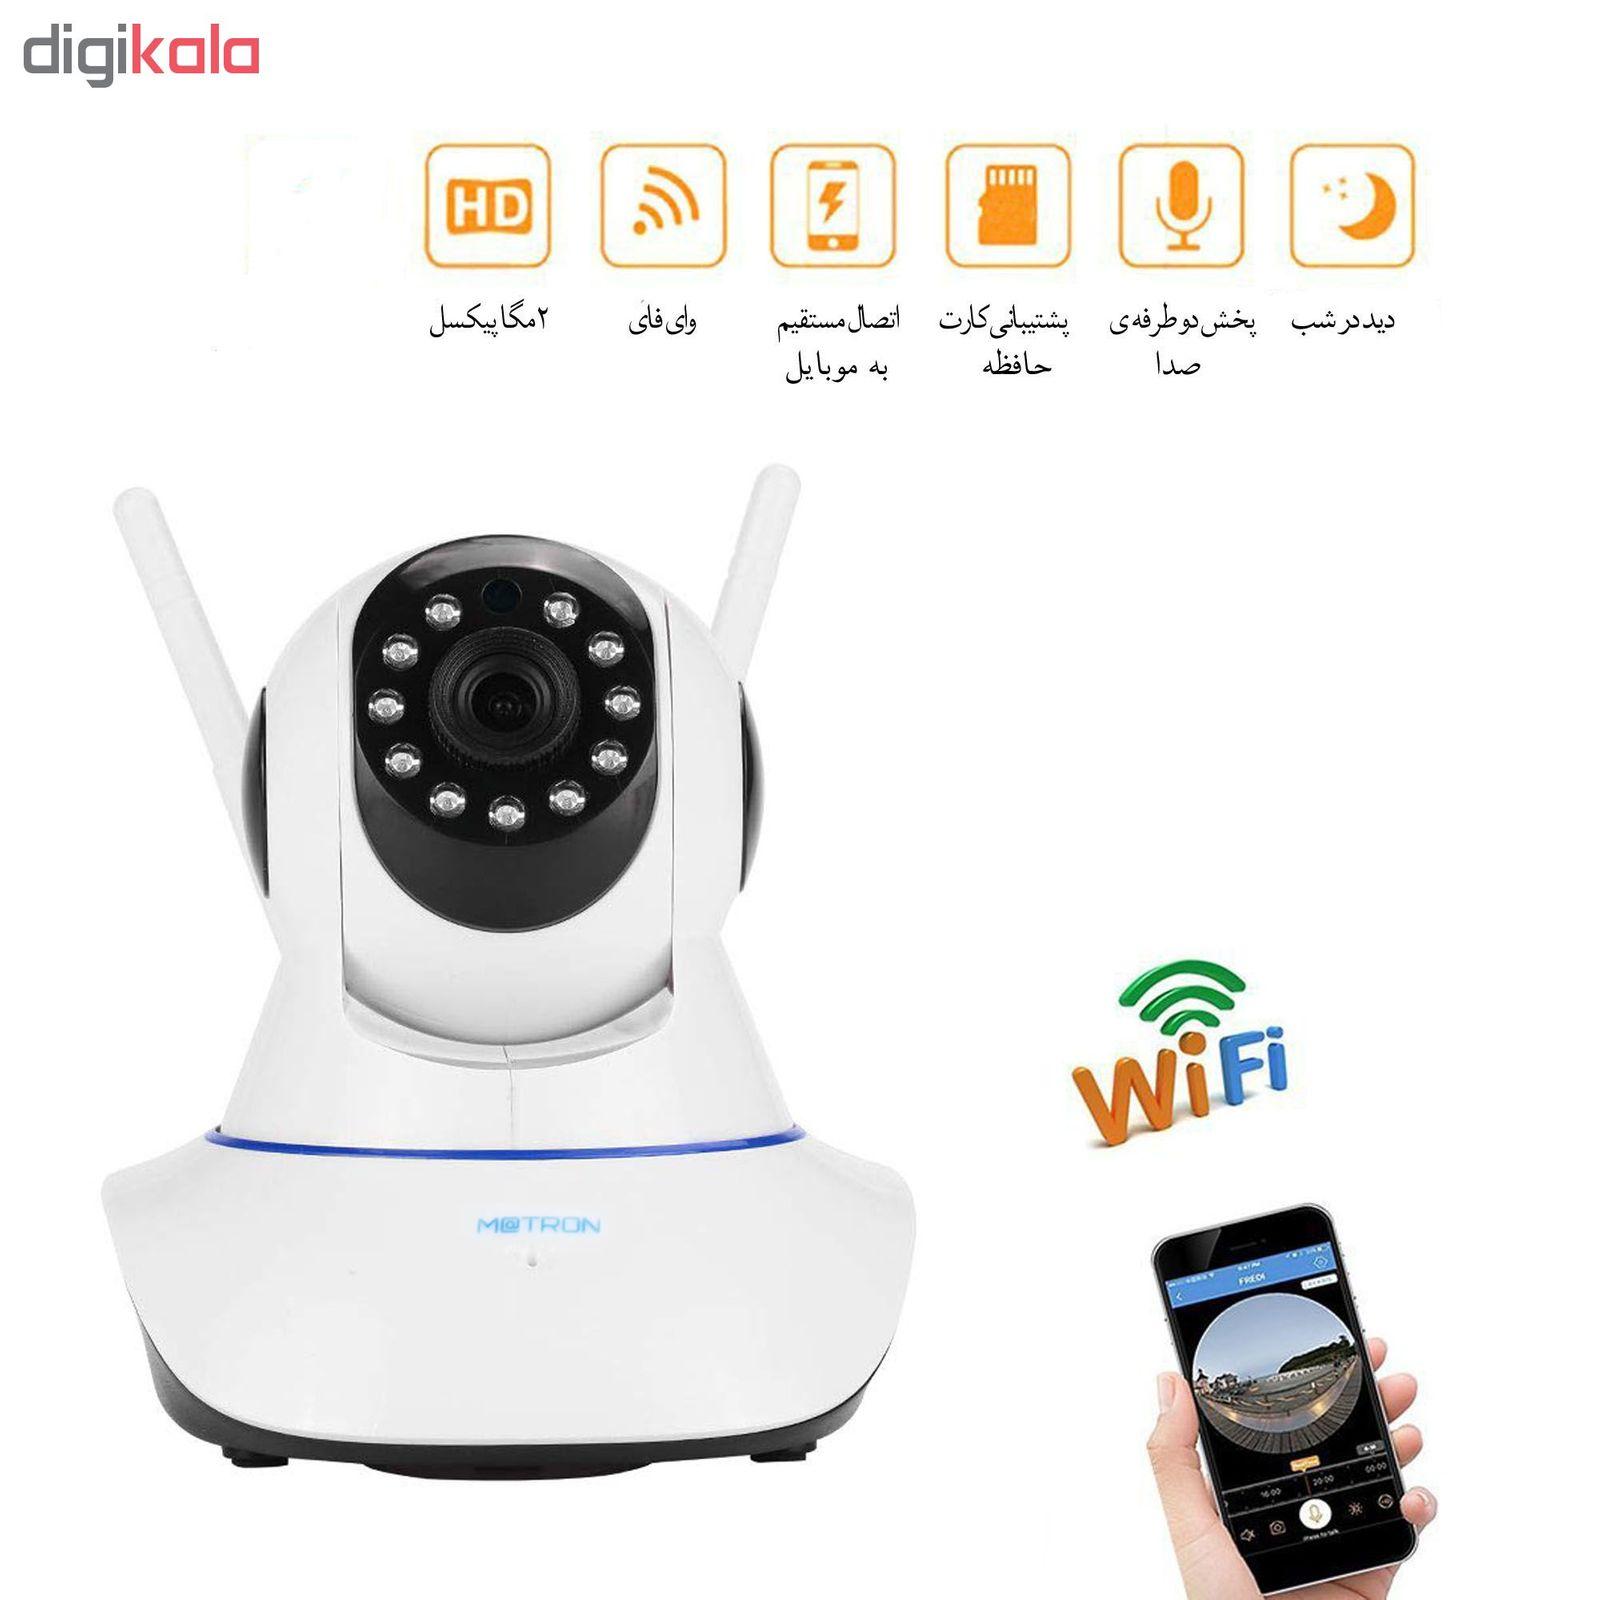 دوربین کنترل کودک ماترون مدل V380S wifi baby w1 main 1 2